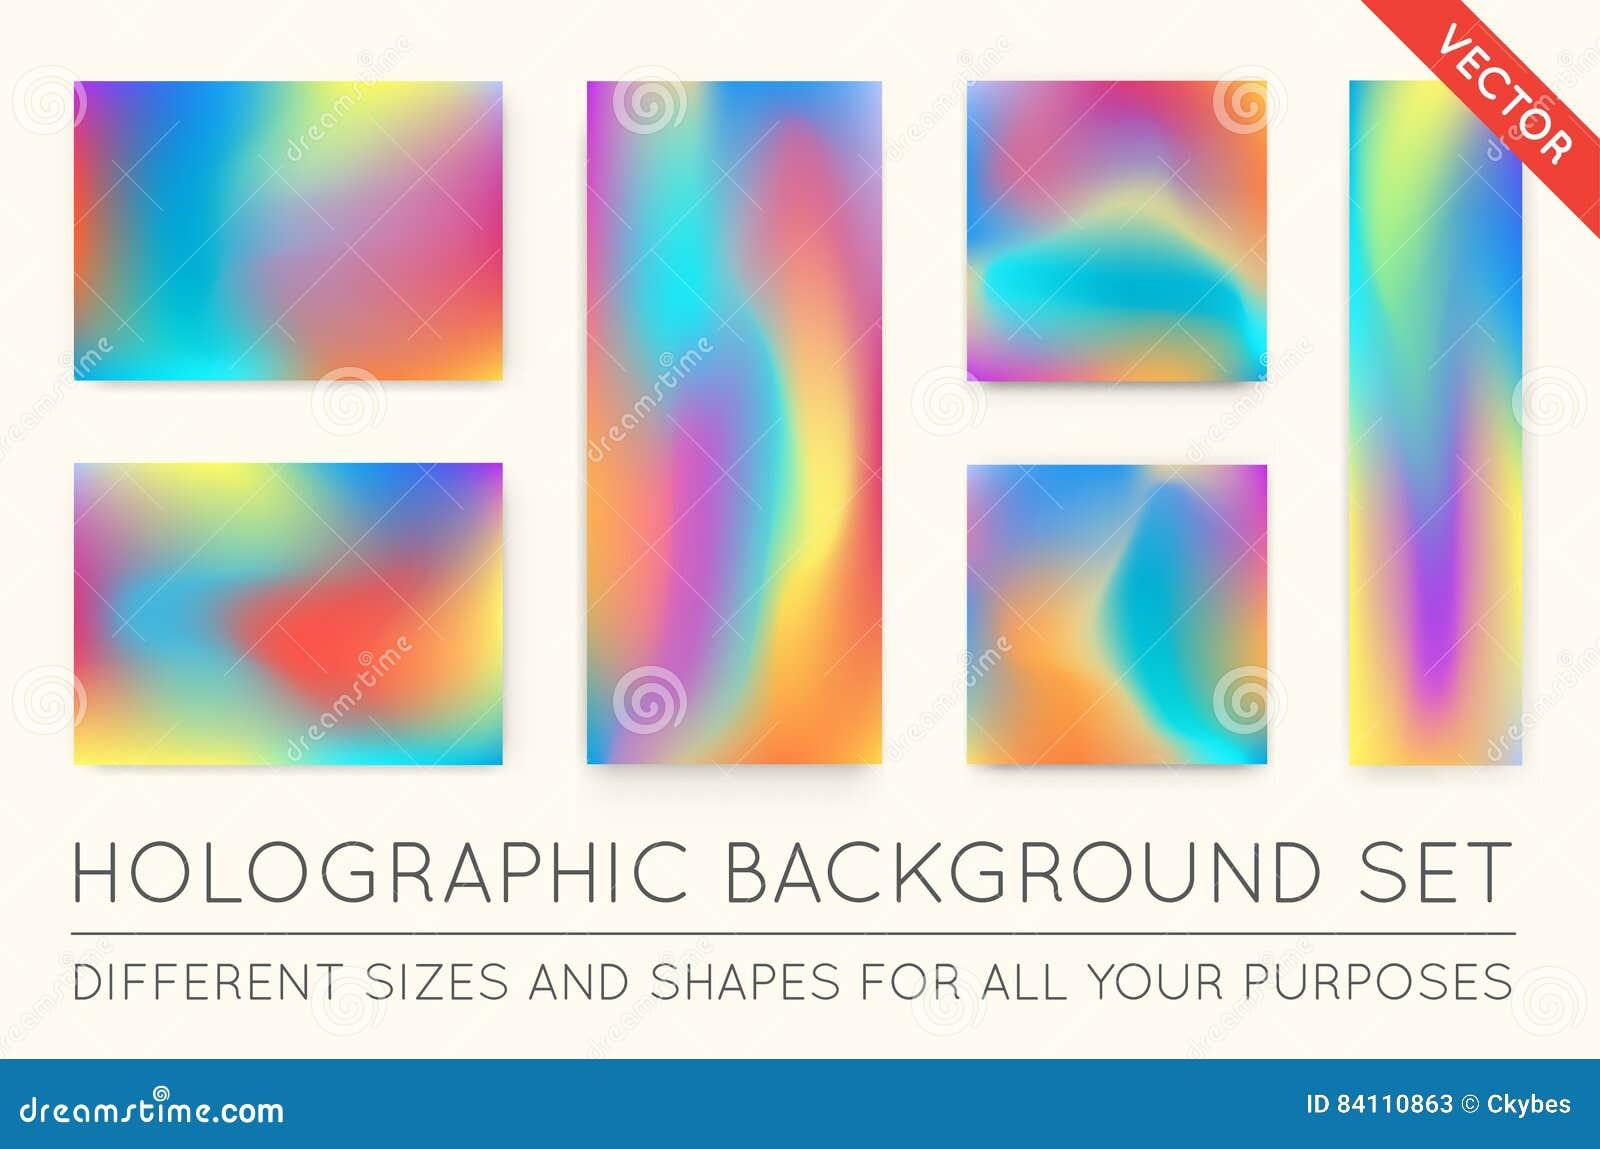 chrome background.html